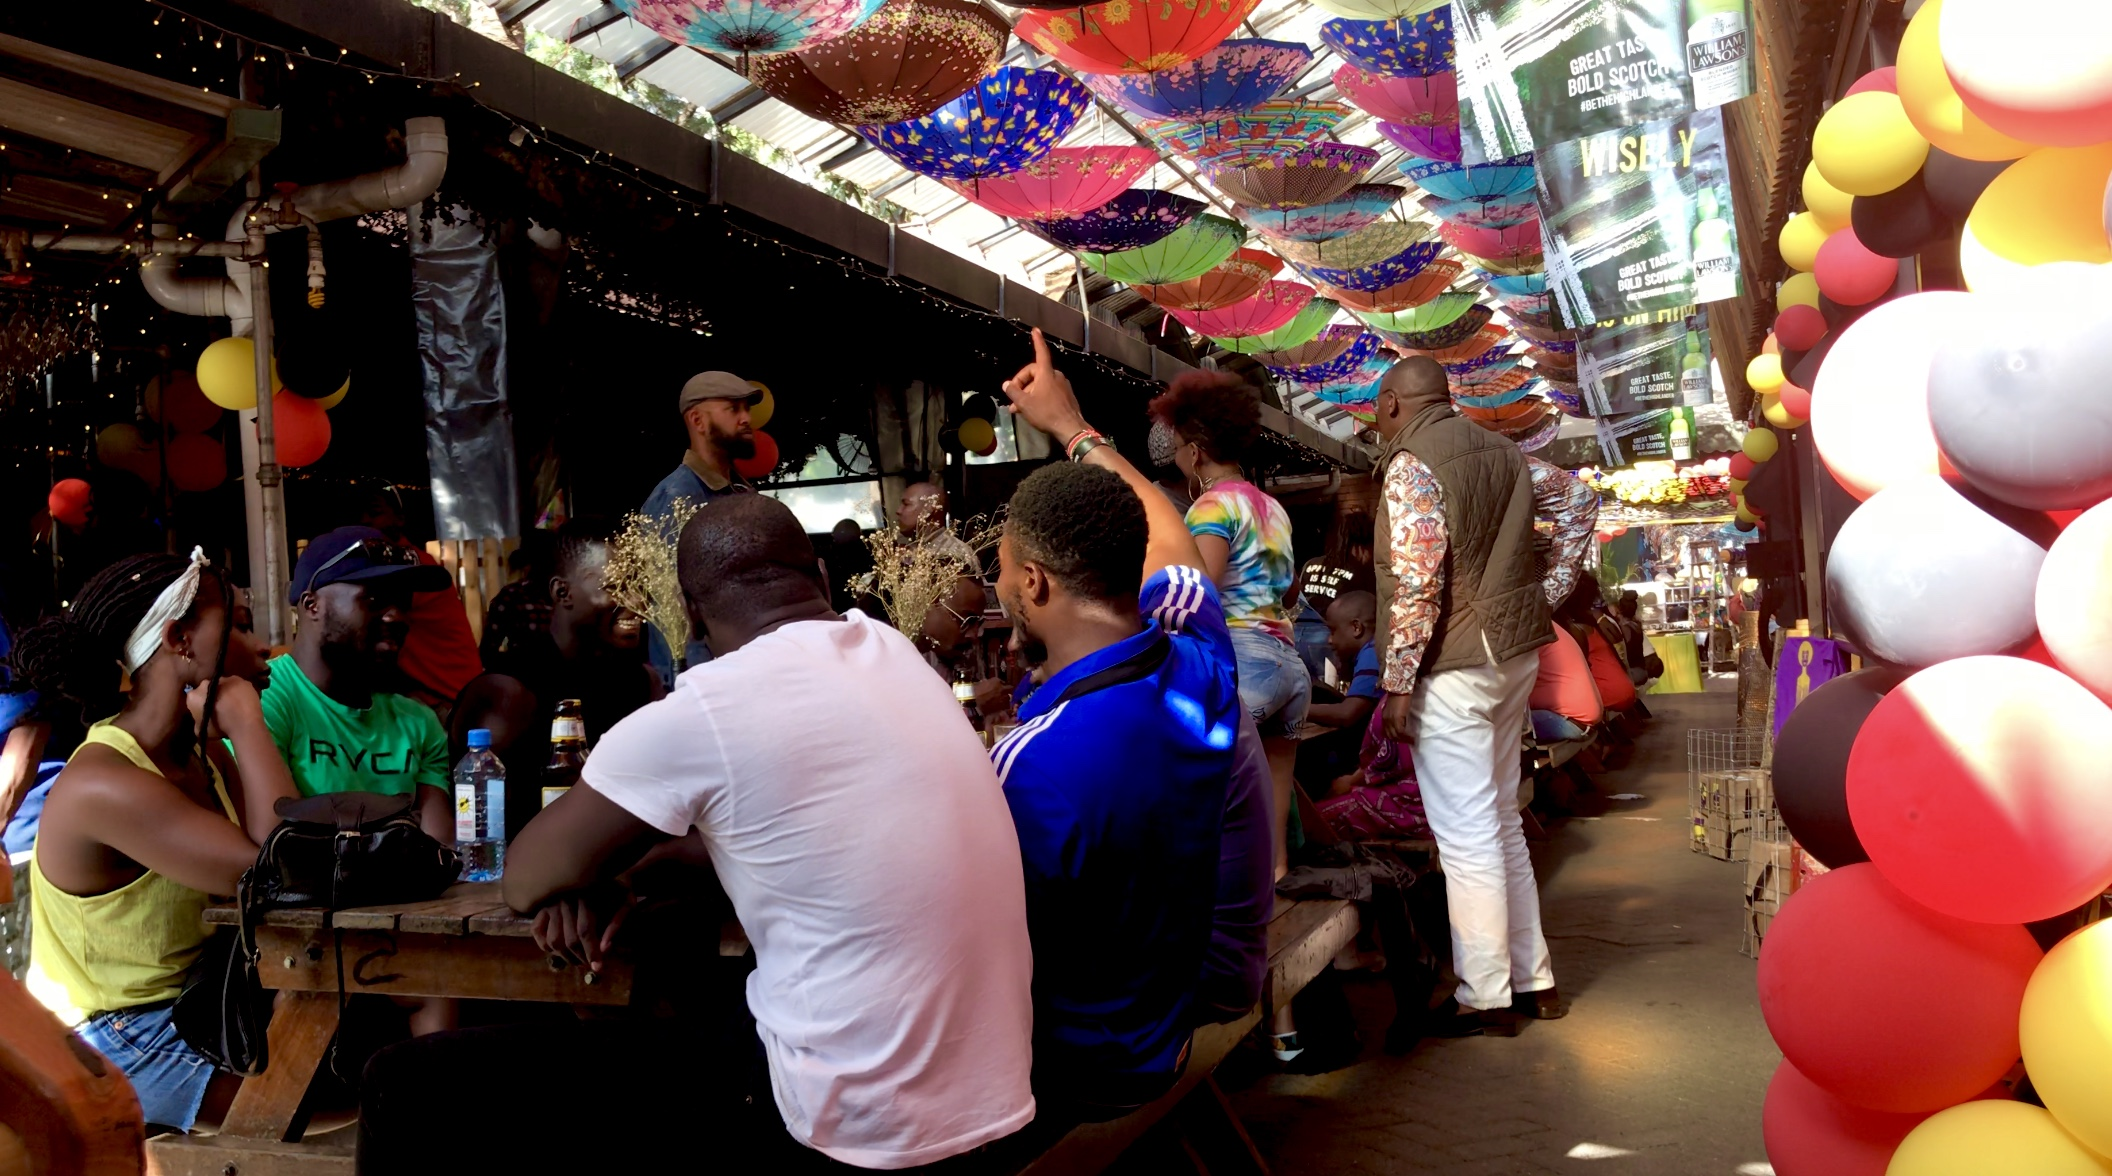 Yimbiha-Sundays-Are-For-Chilling-at-K1-Flea-Market3.jpg